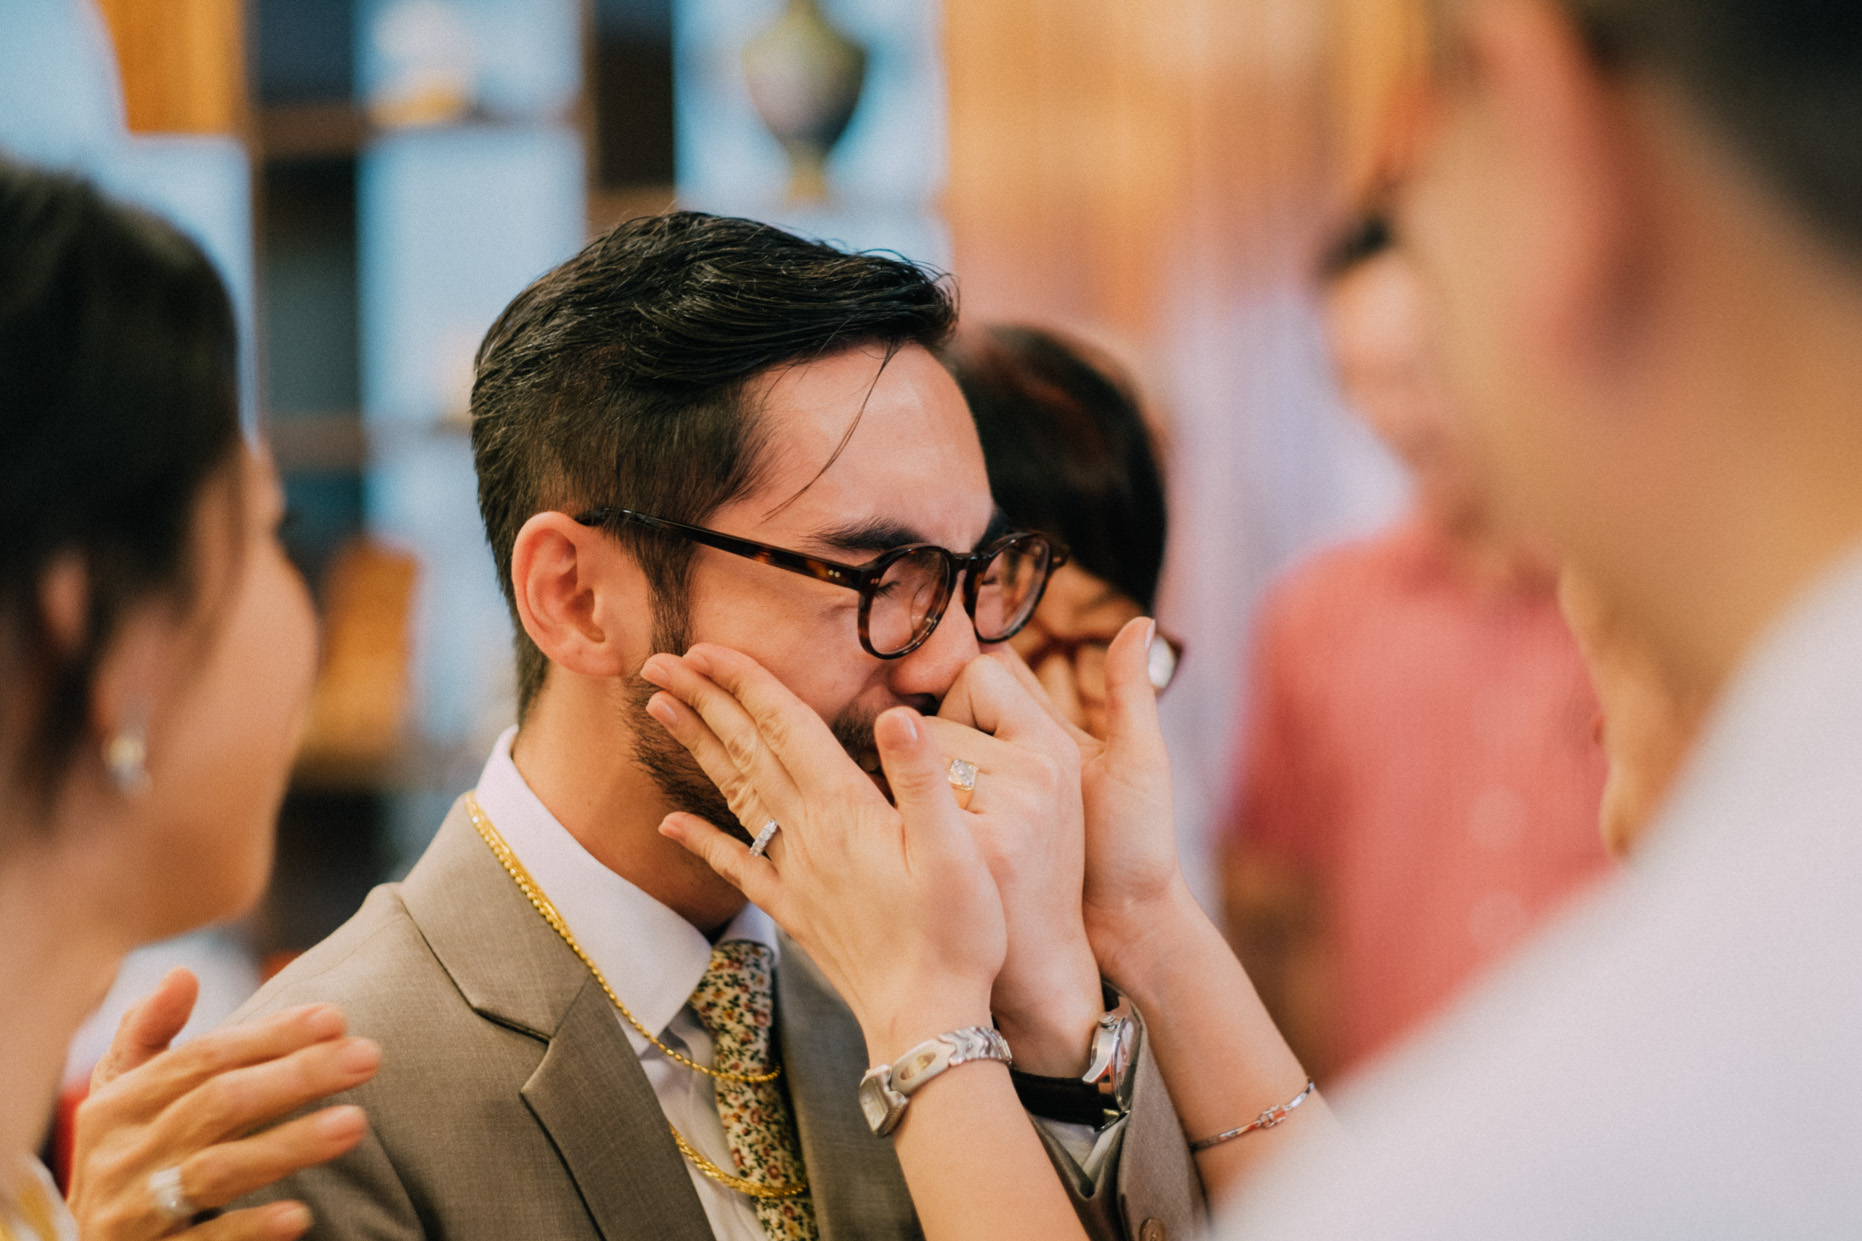 34-hellojanelee-sam grace-malaysia-wedding-day